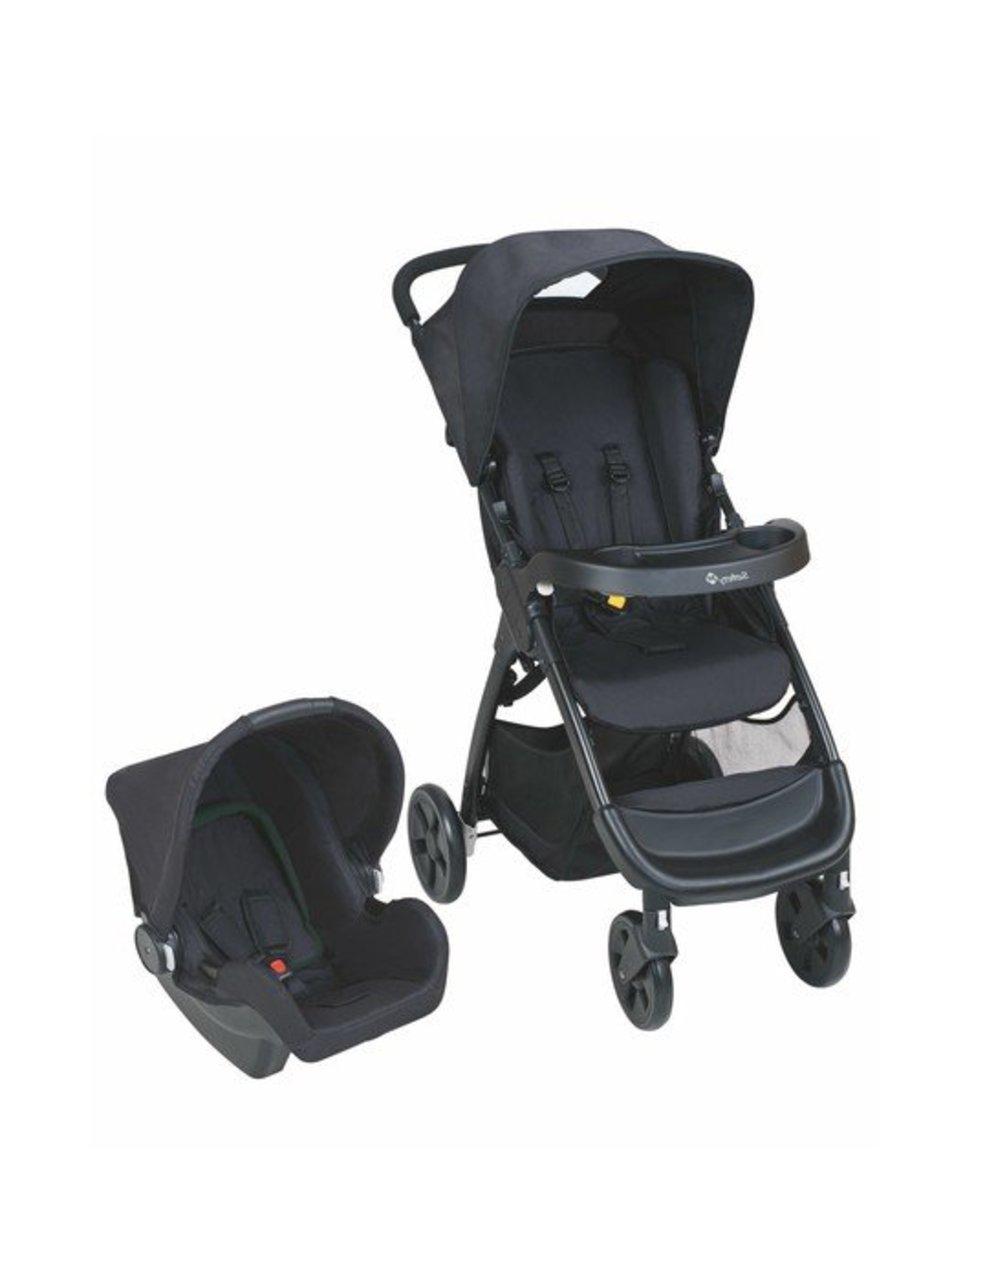 Safety 1st Σύστημα Μετακίνησης 2 σε 1 Amble Full Black